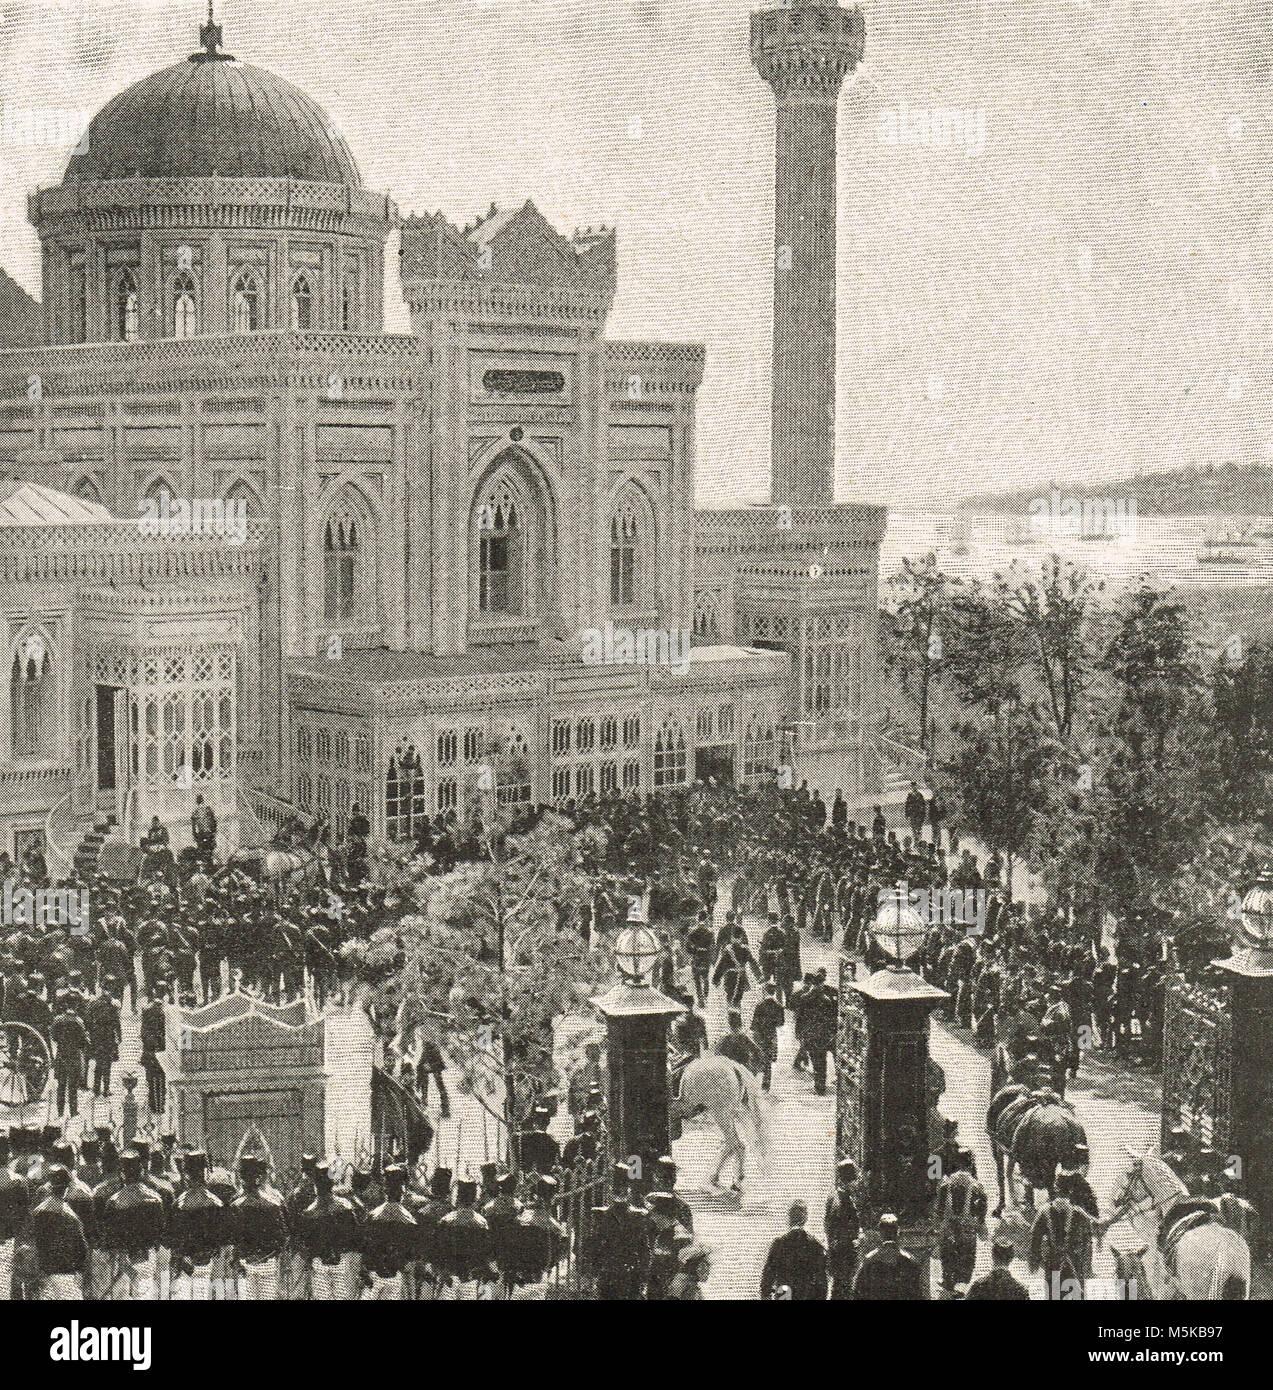 The Ceremony of the Selamlik, Sultan Abdul Hamid II, procession to the mosque, Hamidiye Camii, AKA Yıldız Hamidiye - Stock Image